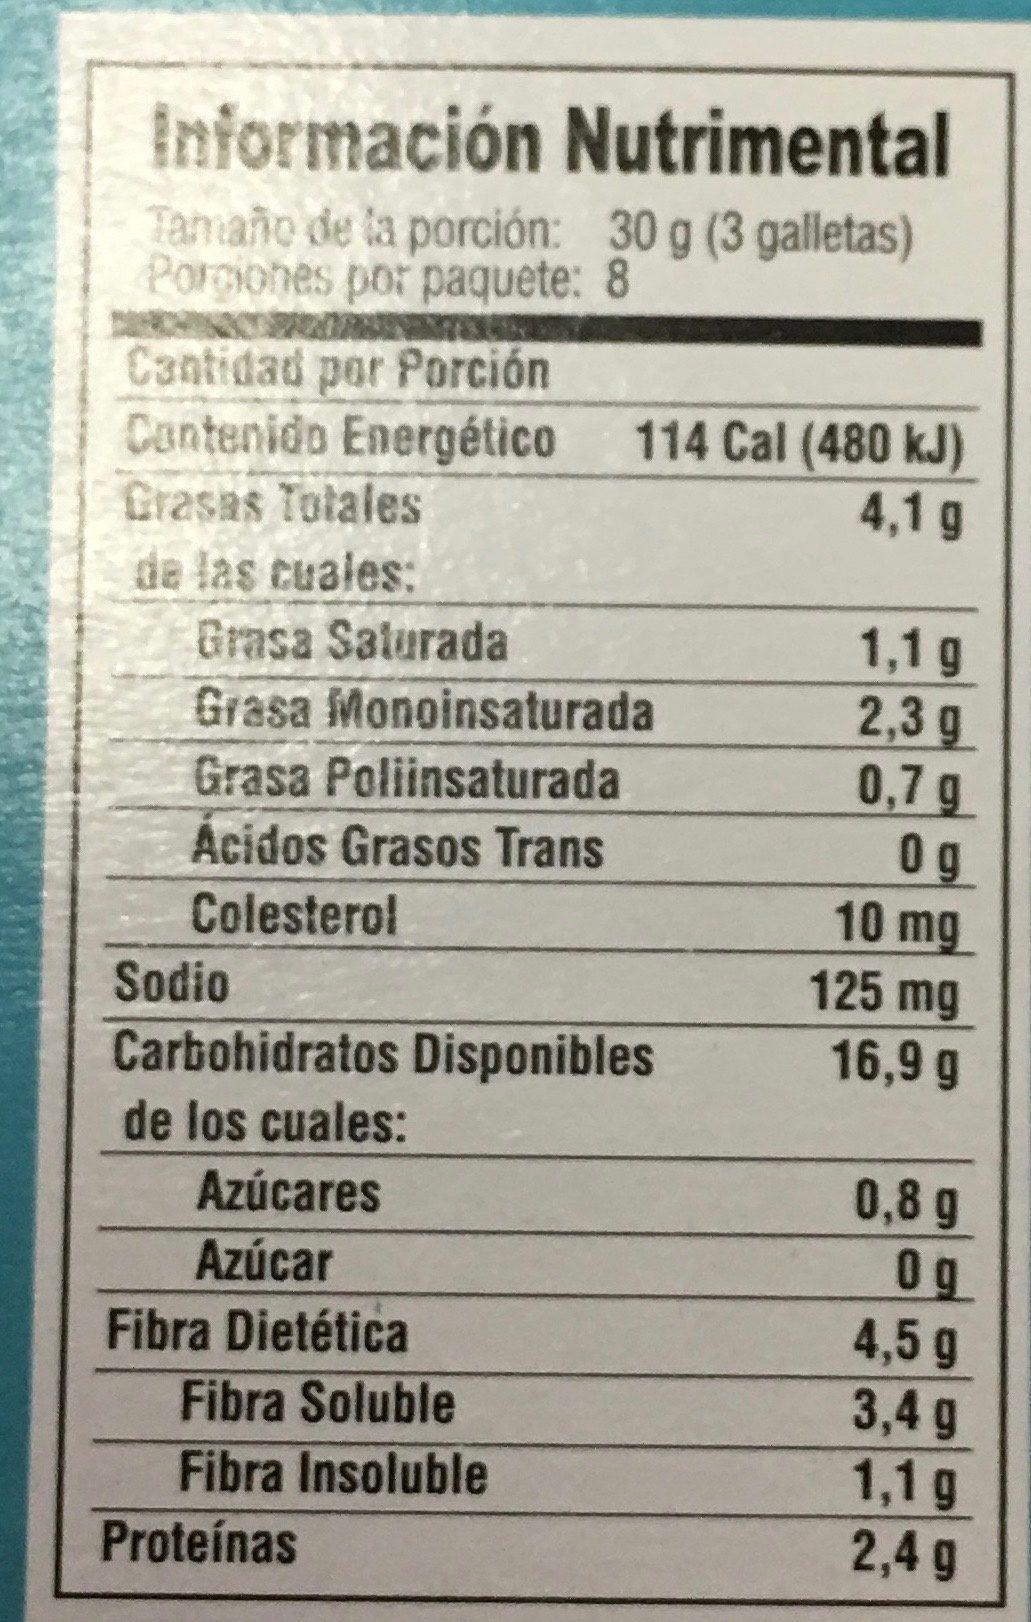 GALLETAS QUAKER VAINILLA - Nutrition facts